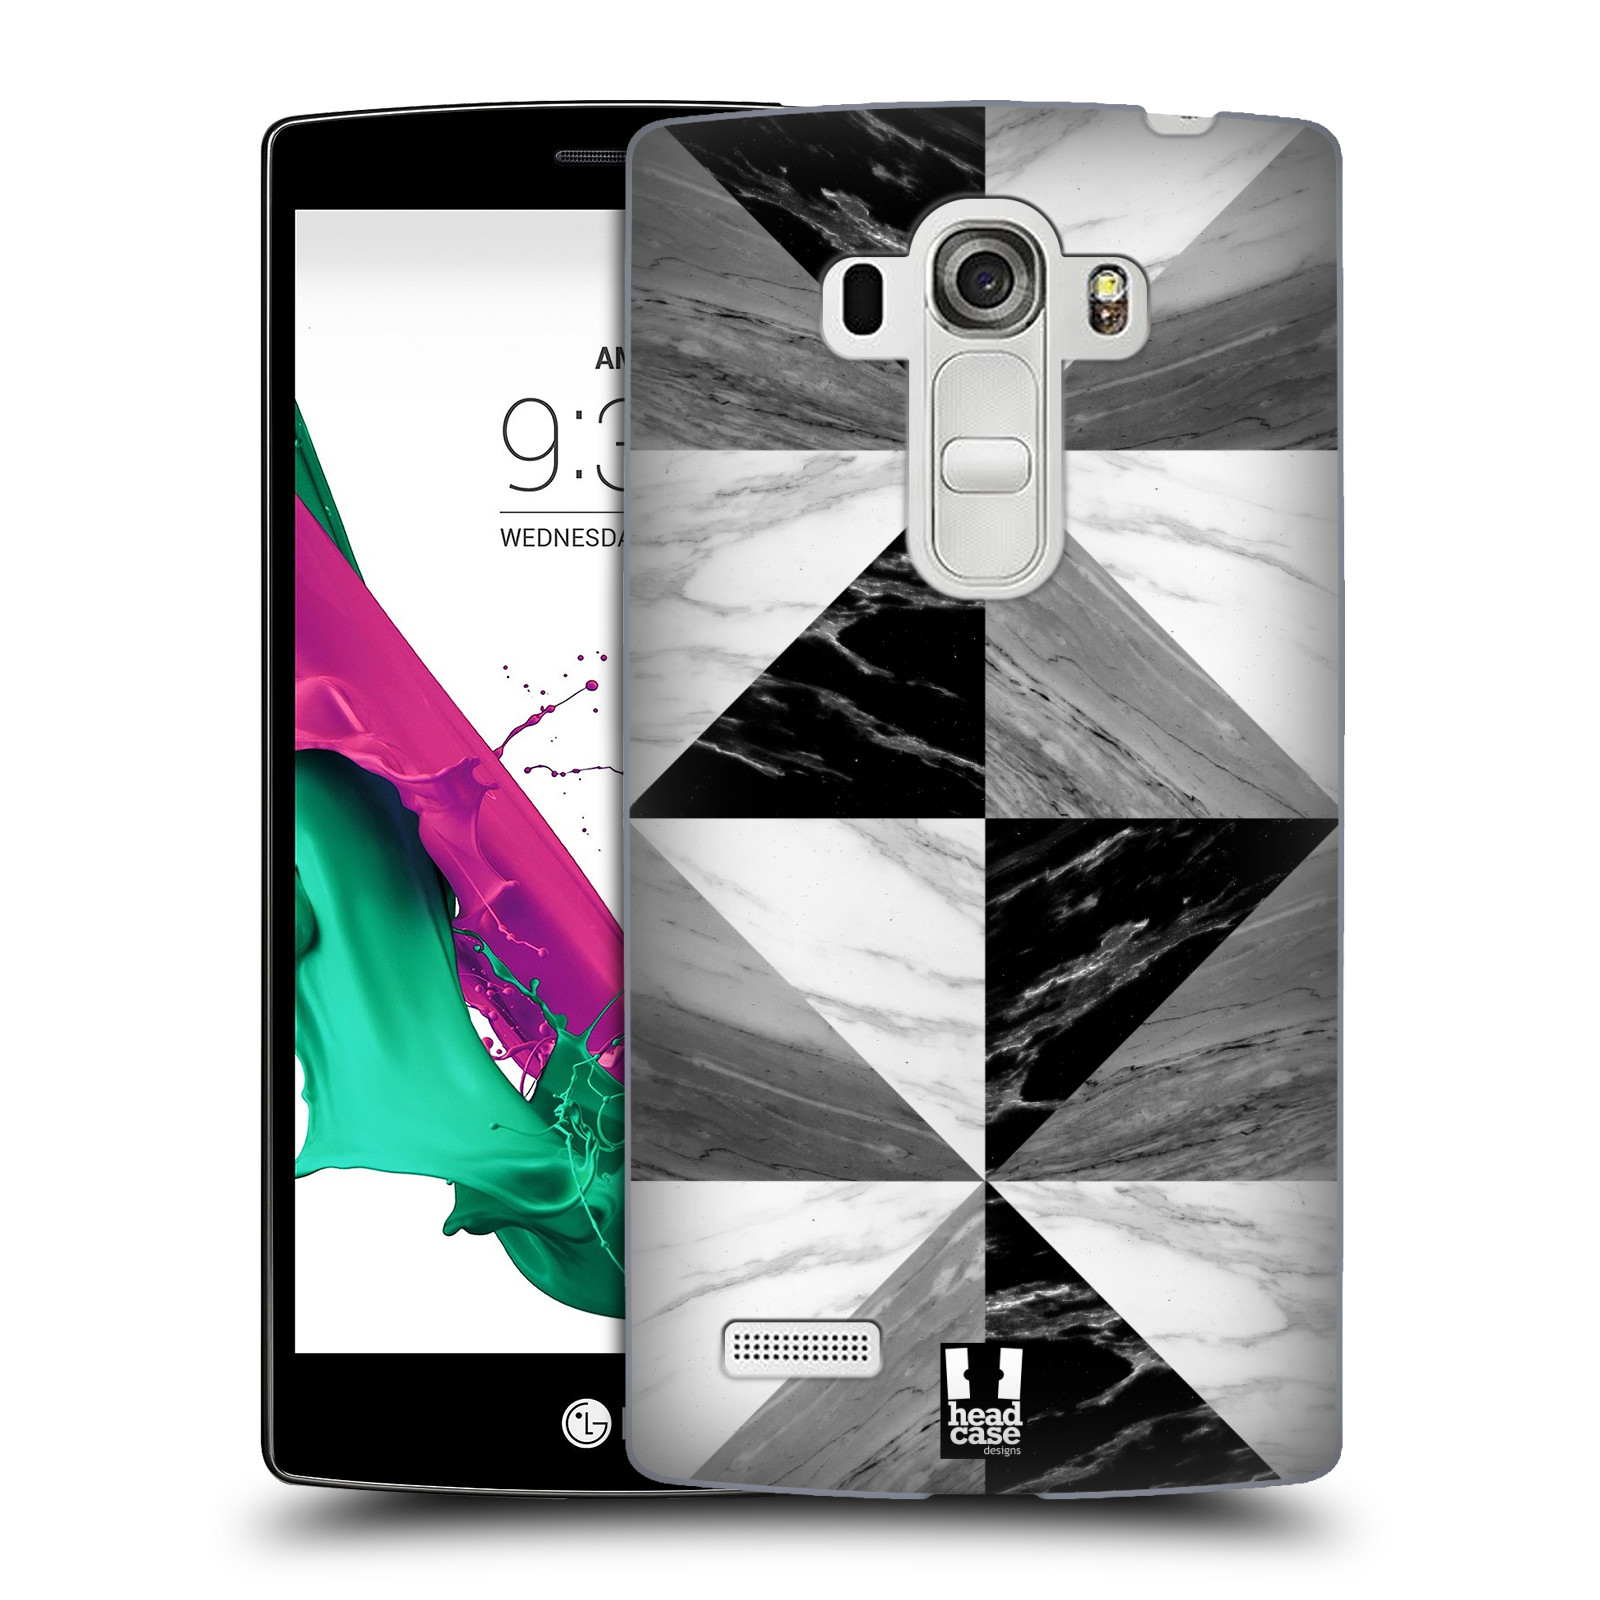 Plastové pouzdro na mobil LG G4s - Head Case - Mramor triangl